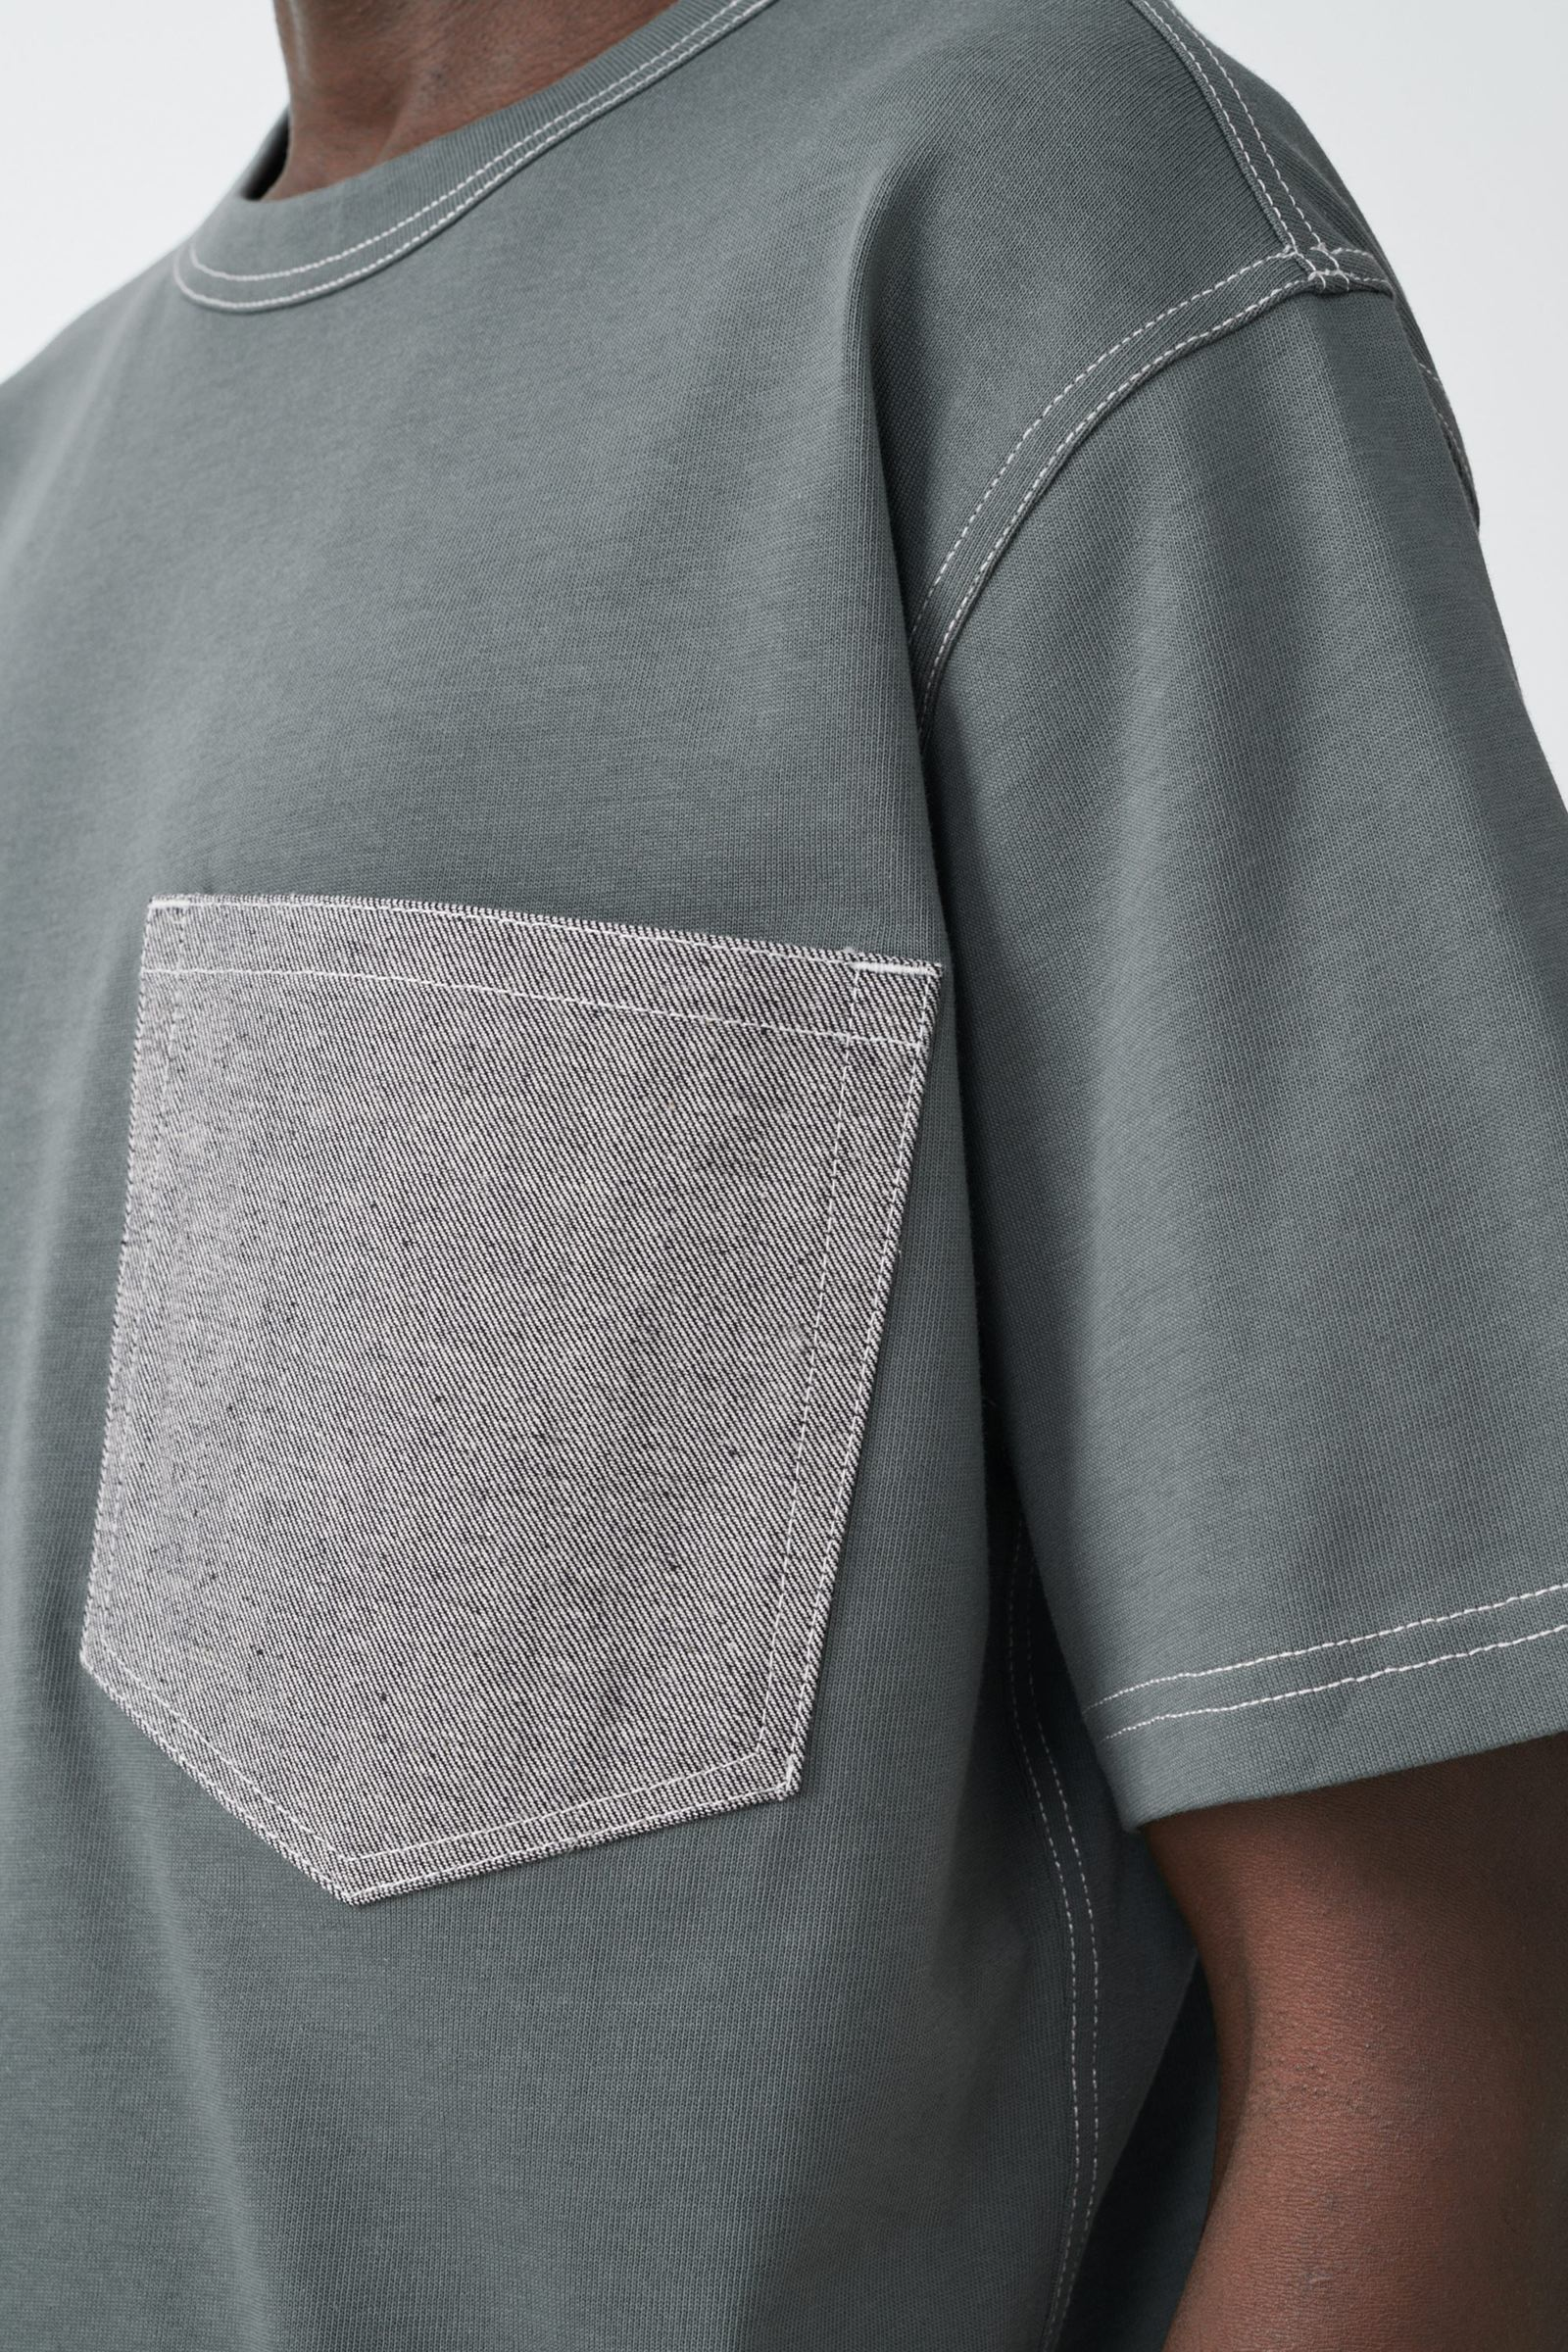 COS 데님 포켓 오가닉 코튼 티셔츠의 그린 / 그레이컬러 ECOMLook입니다.